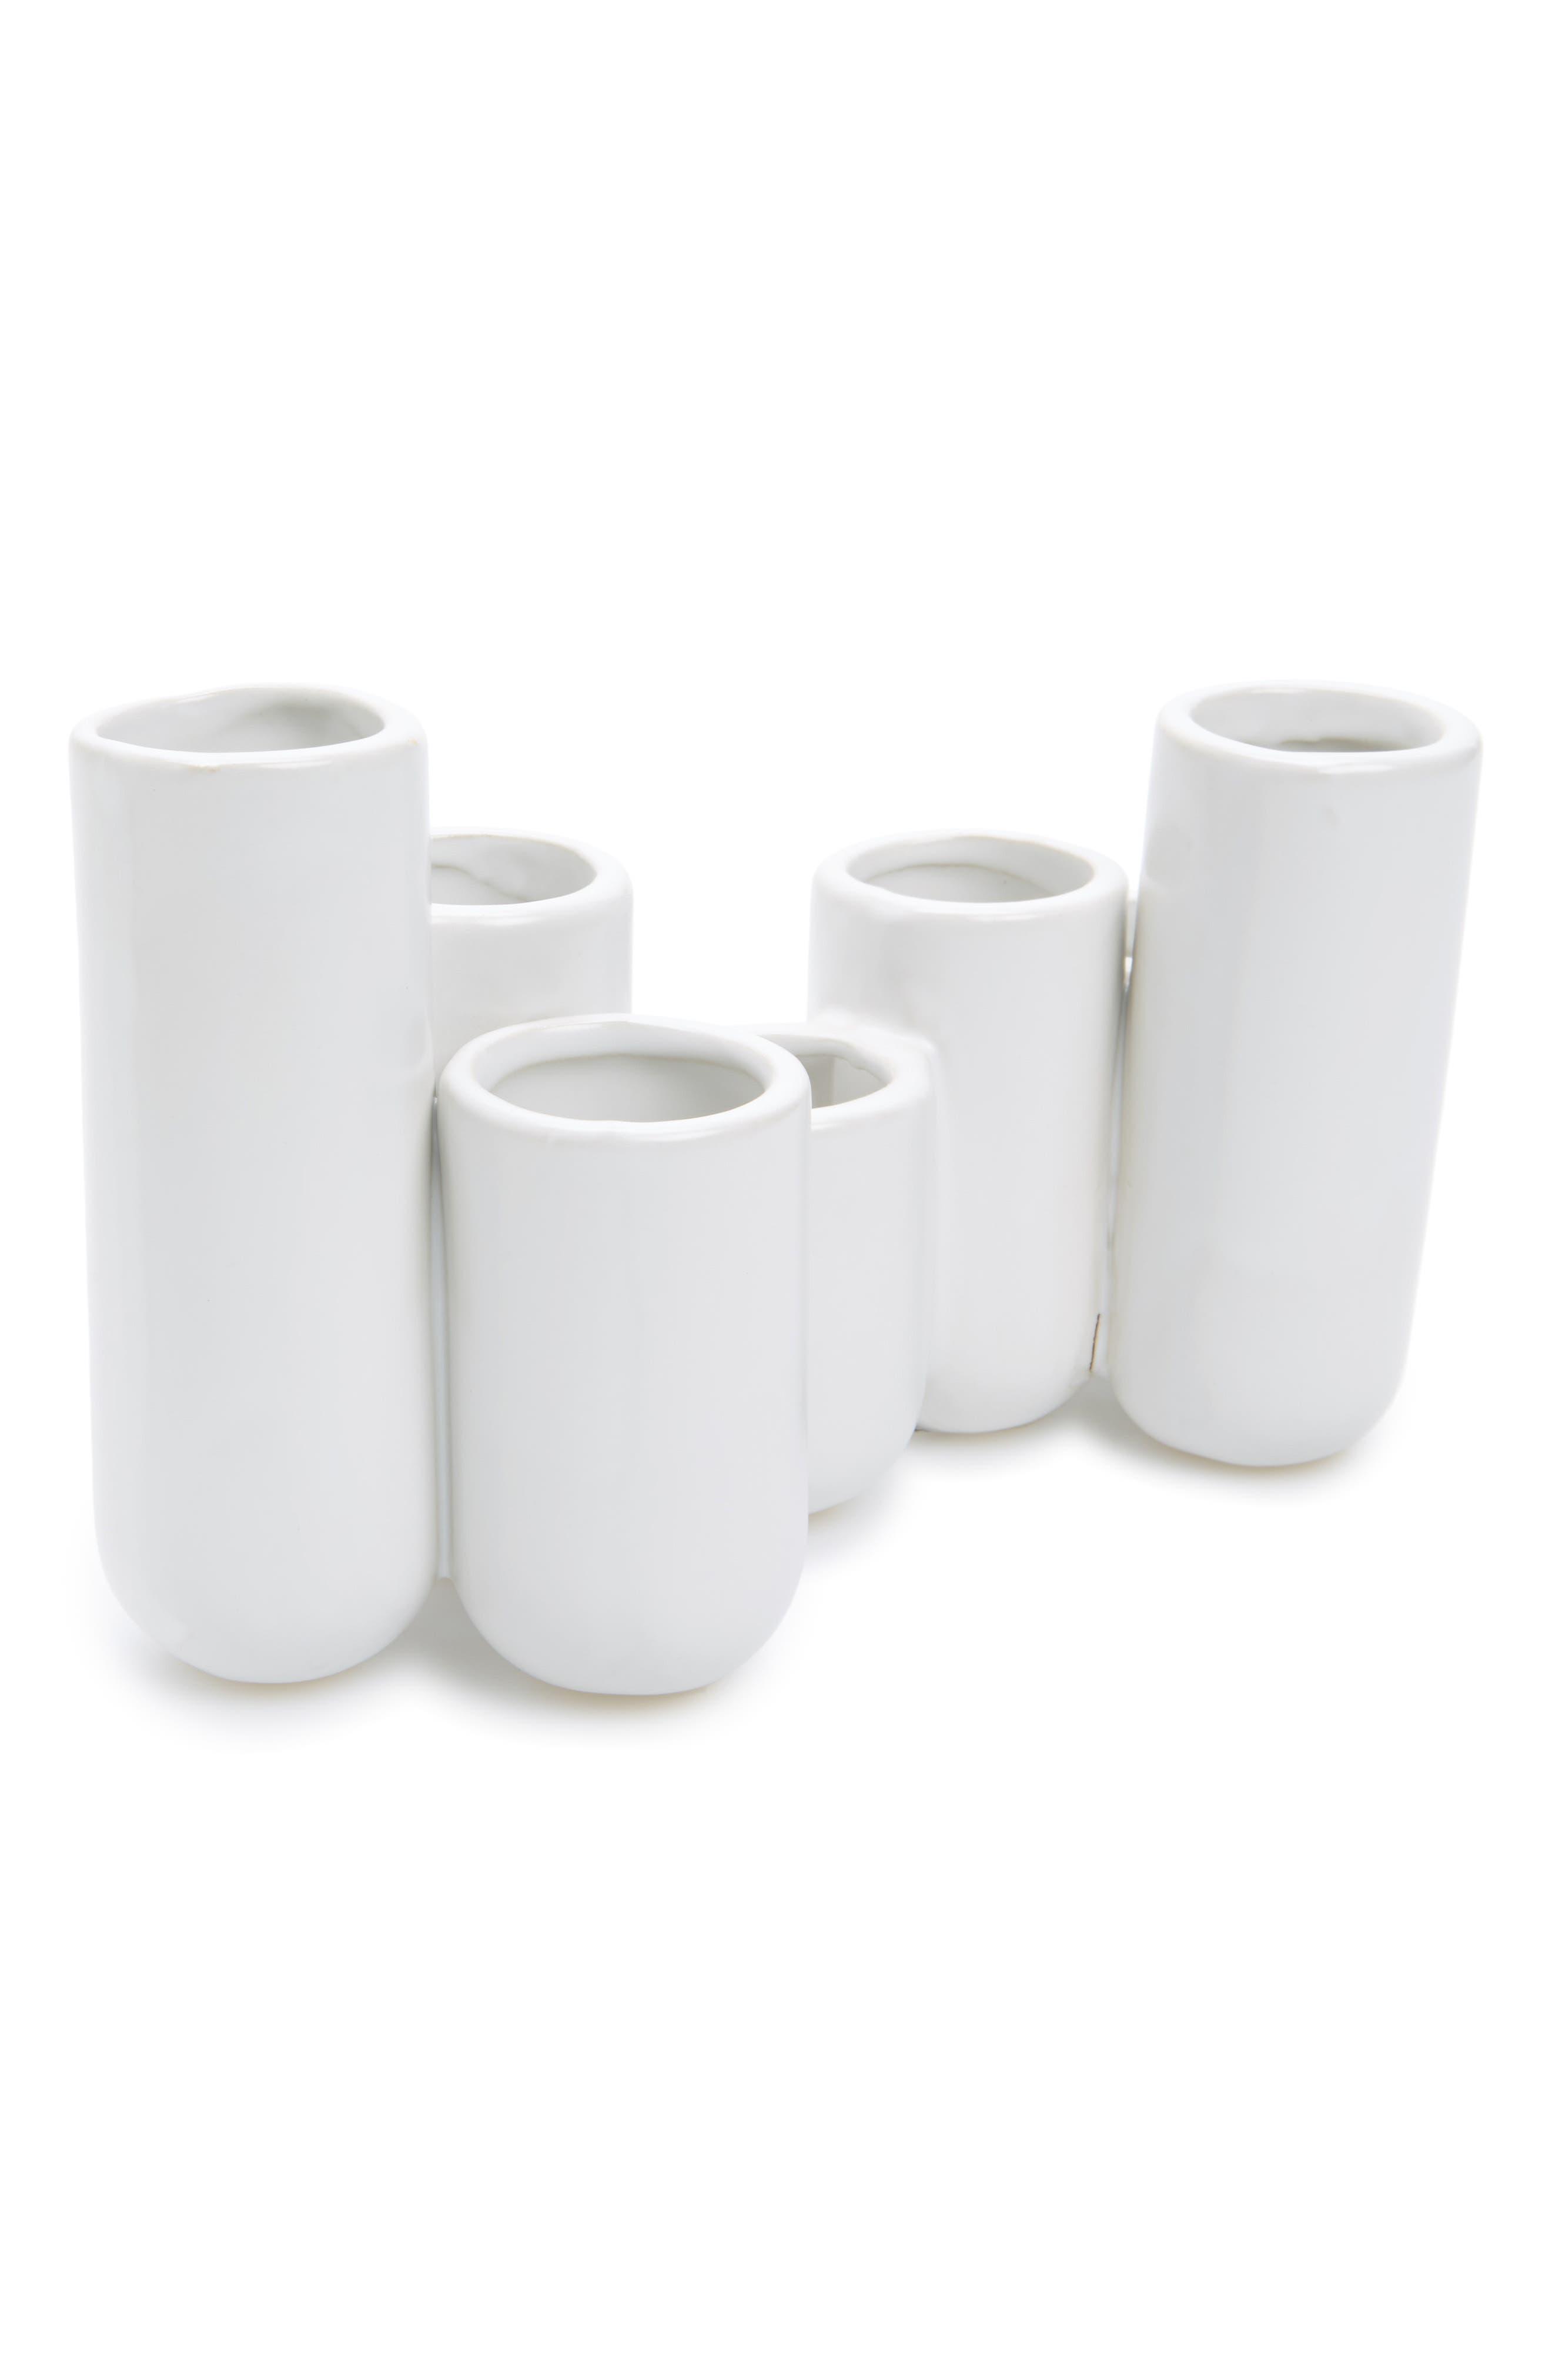 Multi Container Ceramic Bud Vase,                             Main thumbnail 1, color,                             Matte White